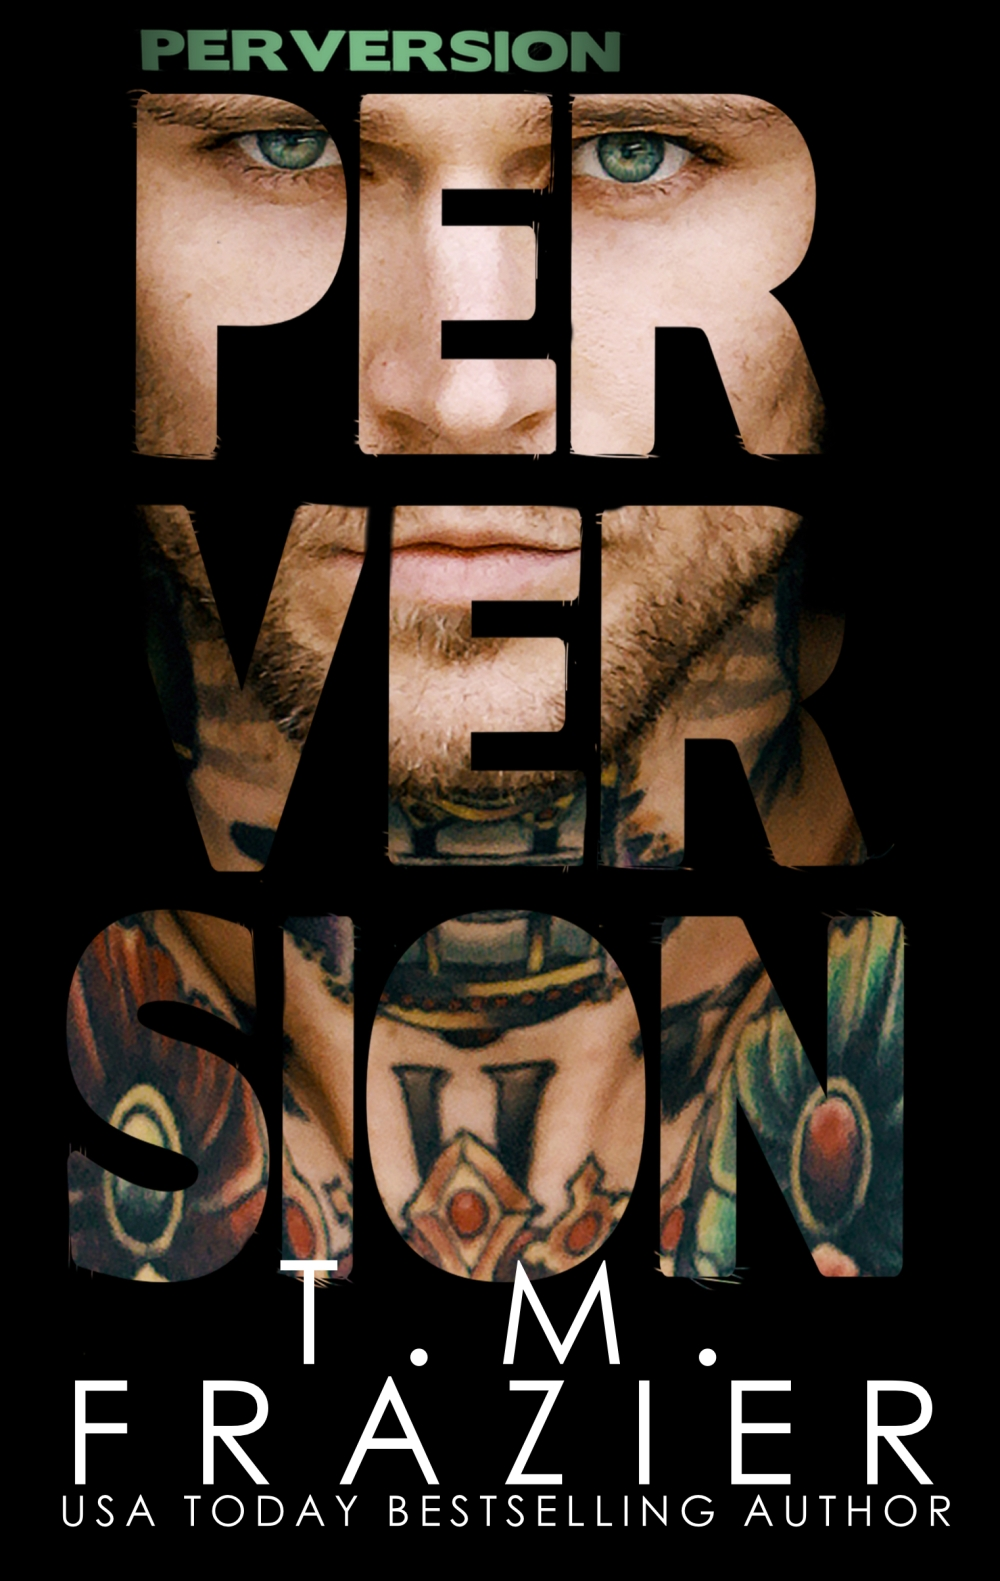 PERVERSION FRONT AMAZON.jpg